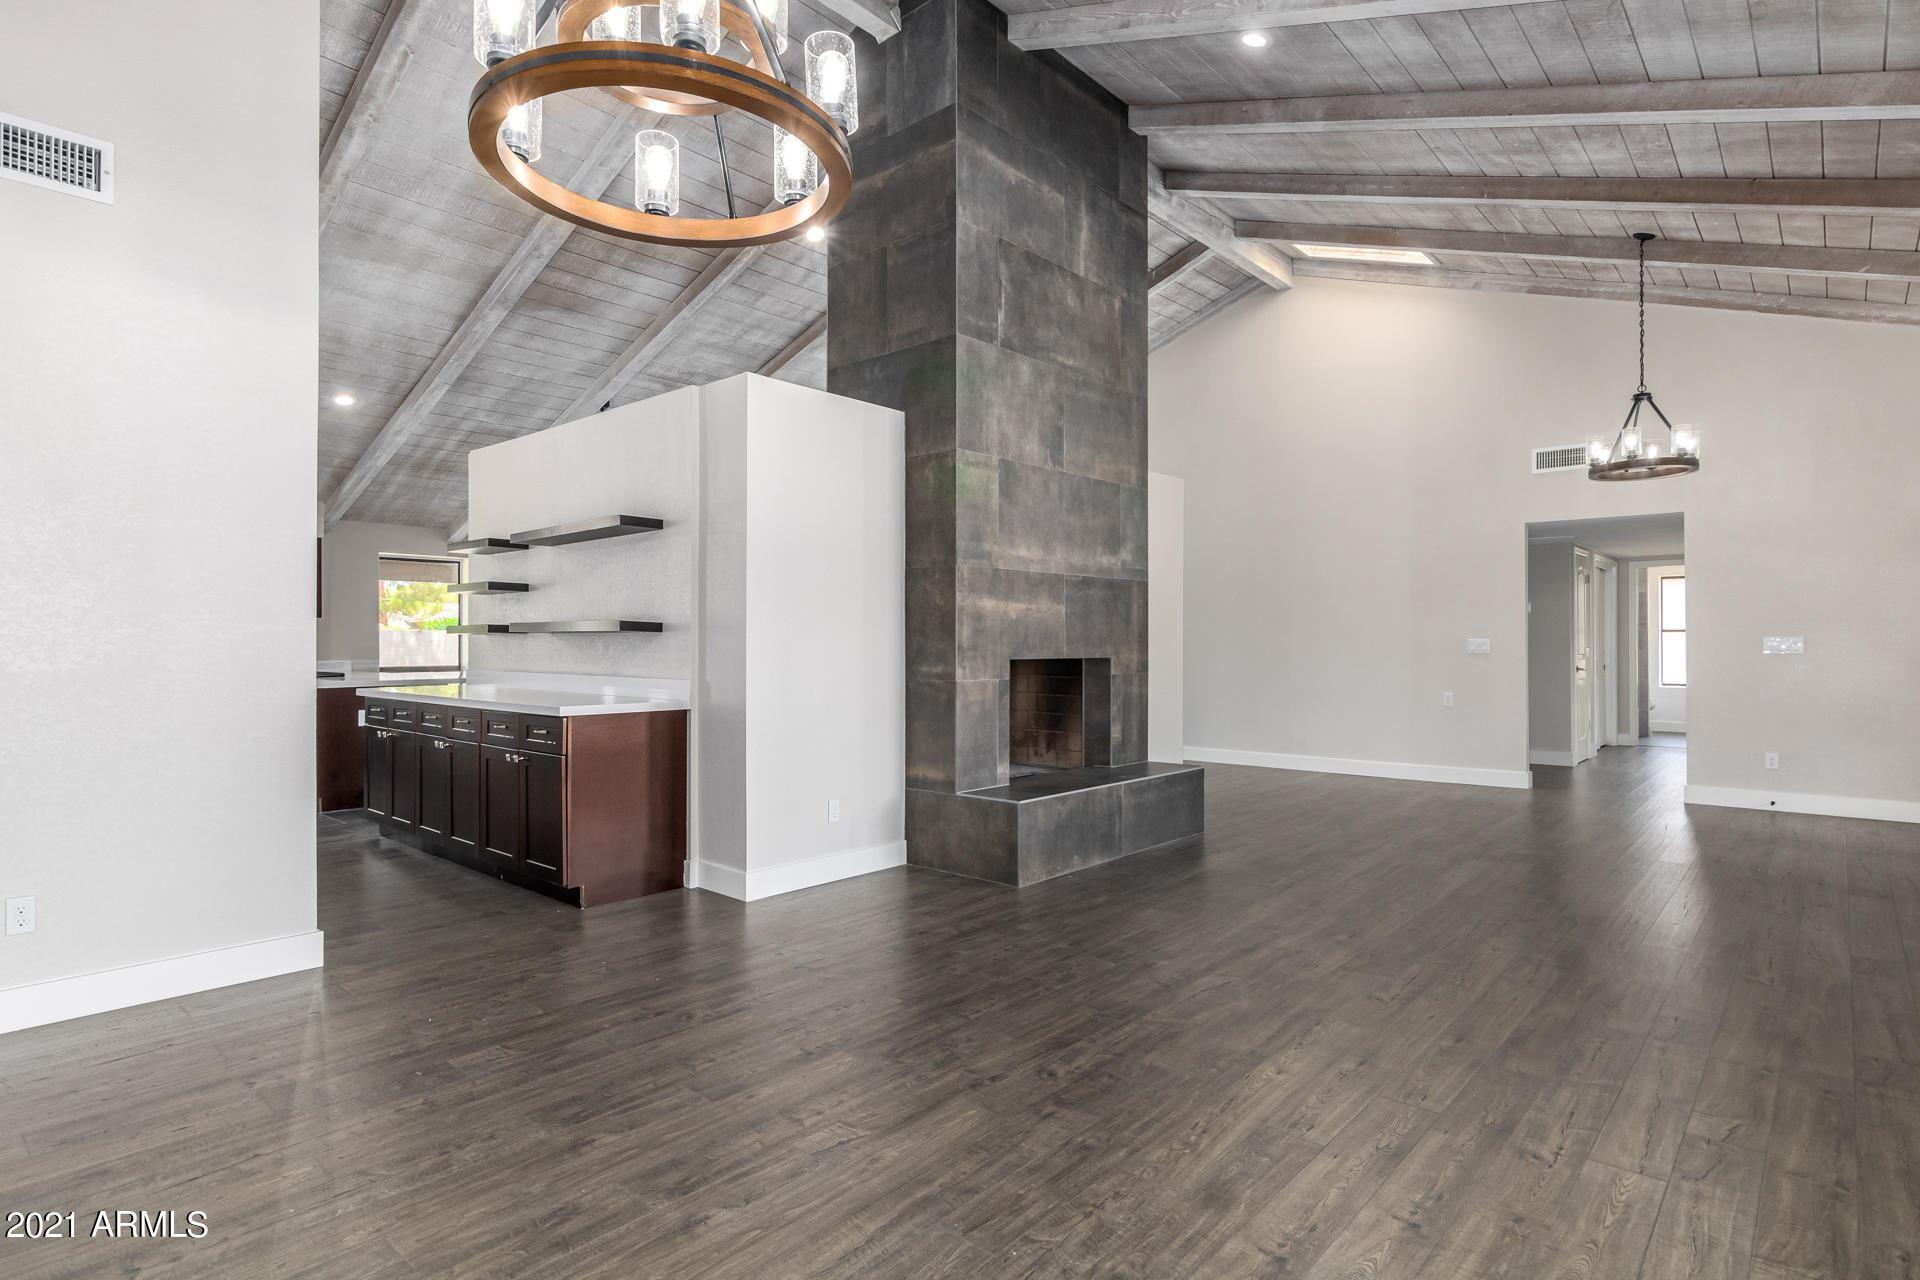 Photo of 7810 W BLUEFIELD Avenue, Glendale, AZ 85308 (MLS # 6232500)